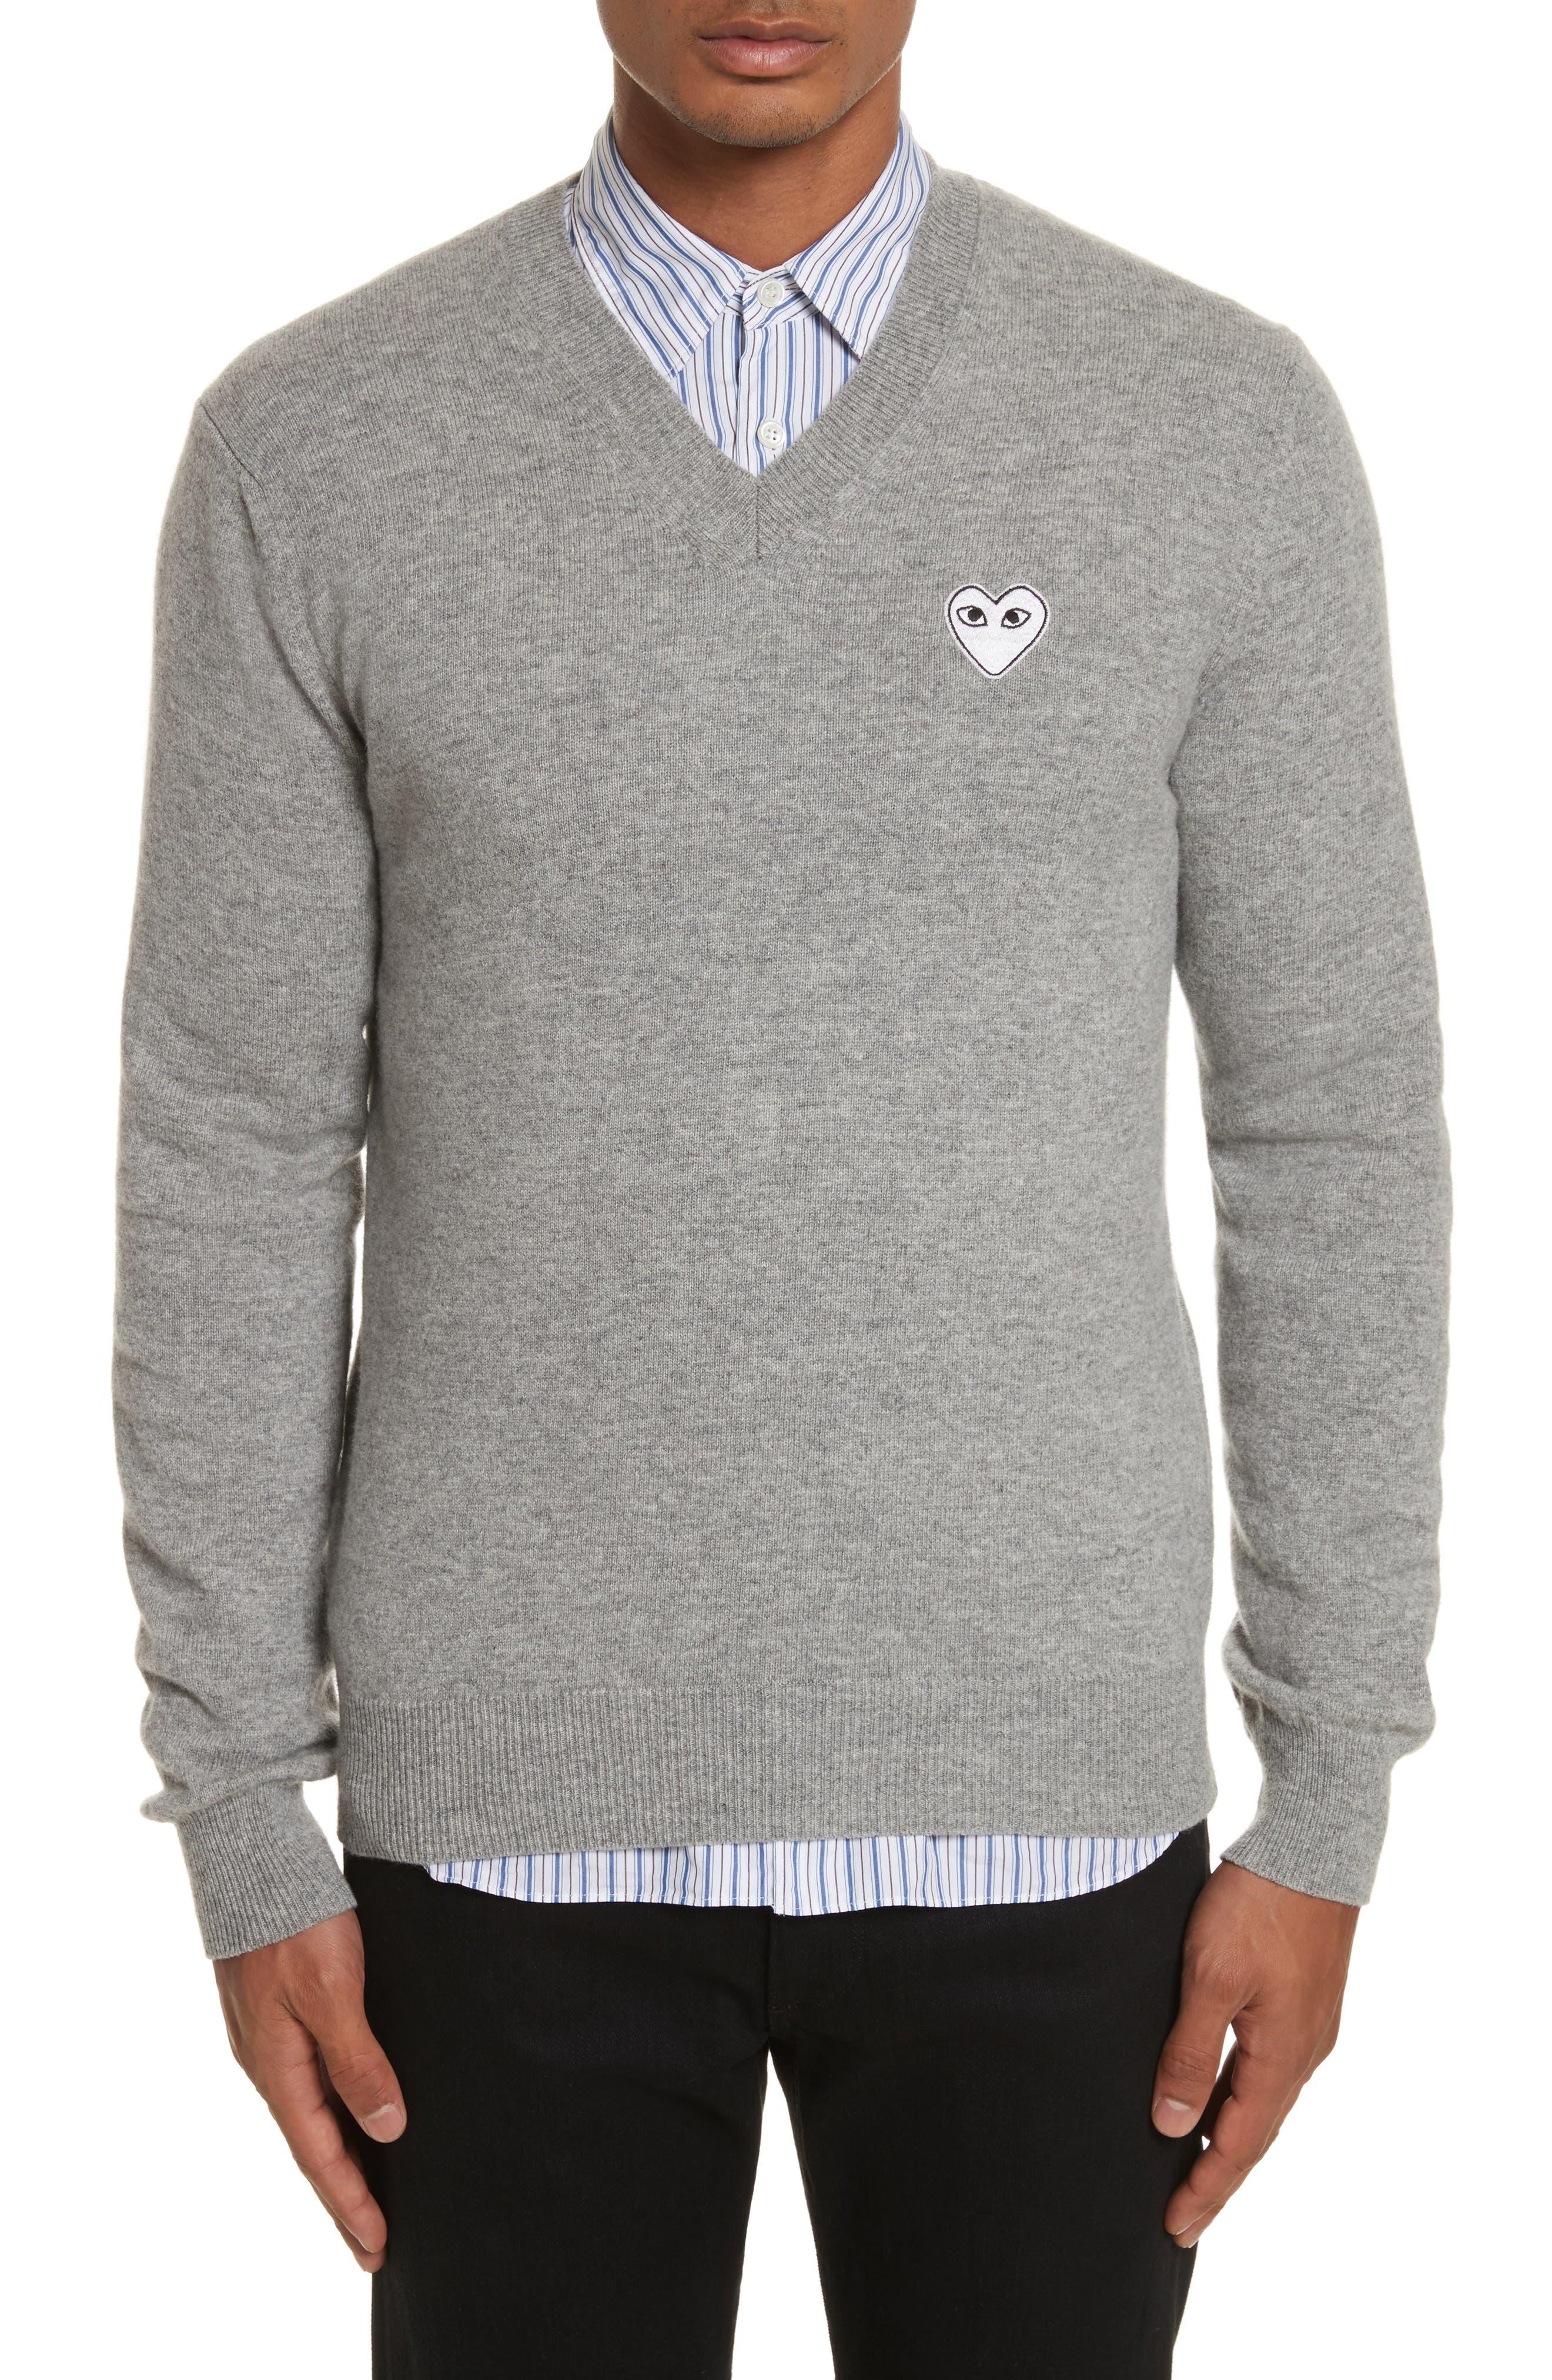 Comme des Garçons White Heart Wool V-Neck Sweater